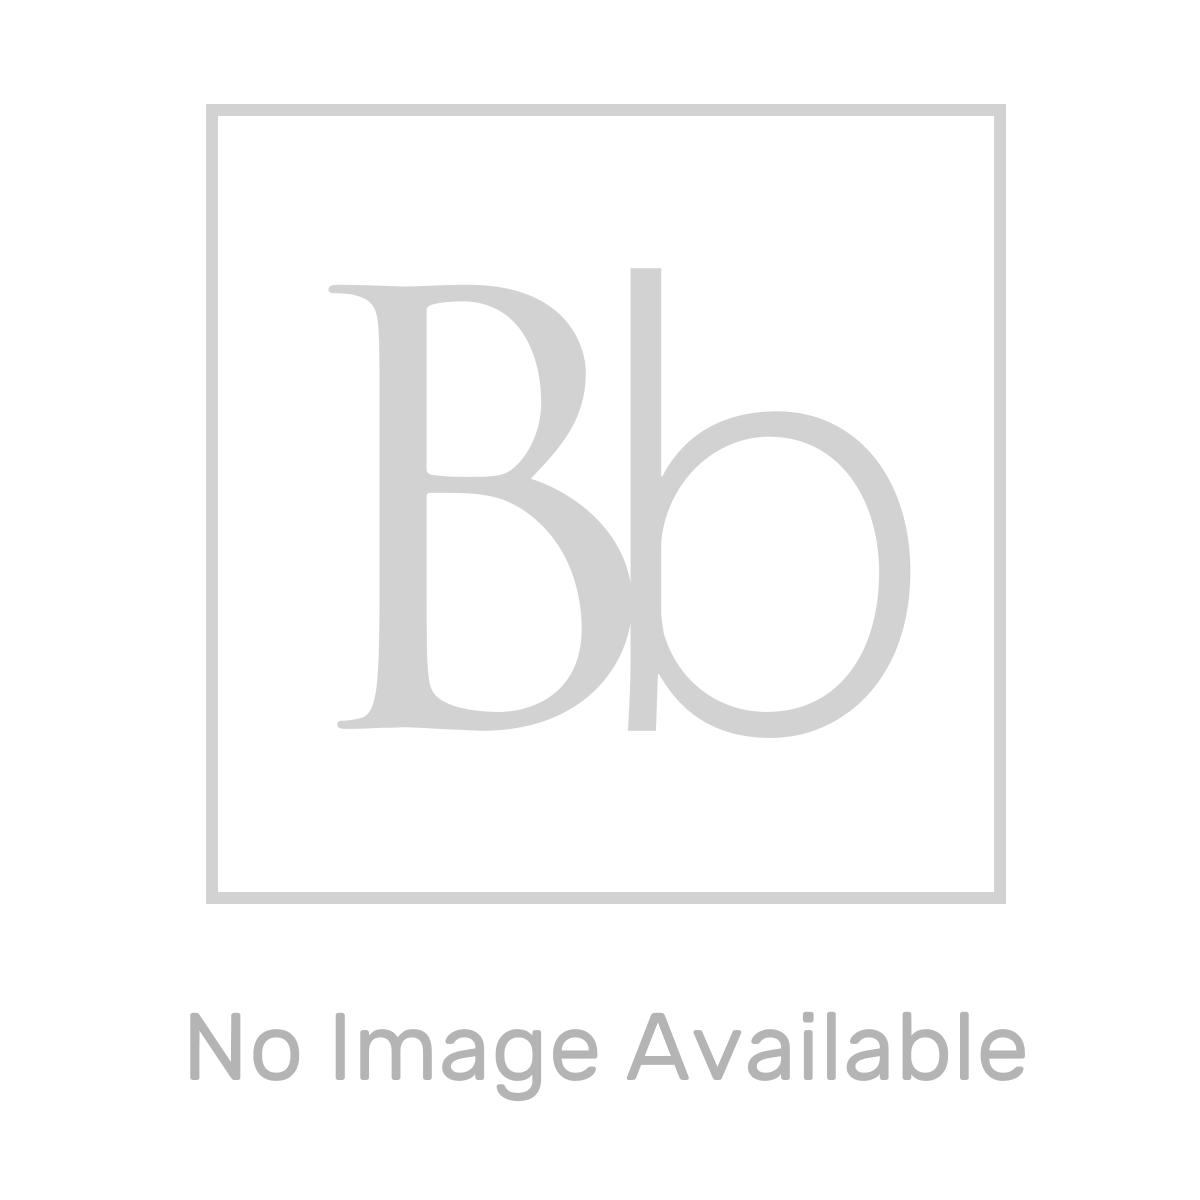 Old London Twilight Blue End Bath Panel 800mm